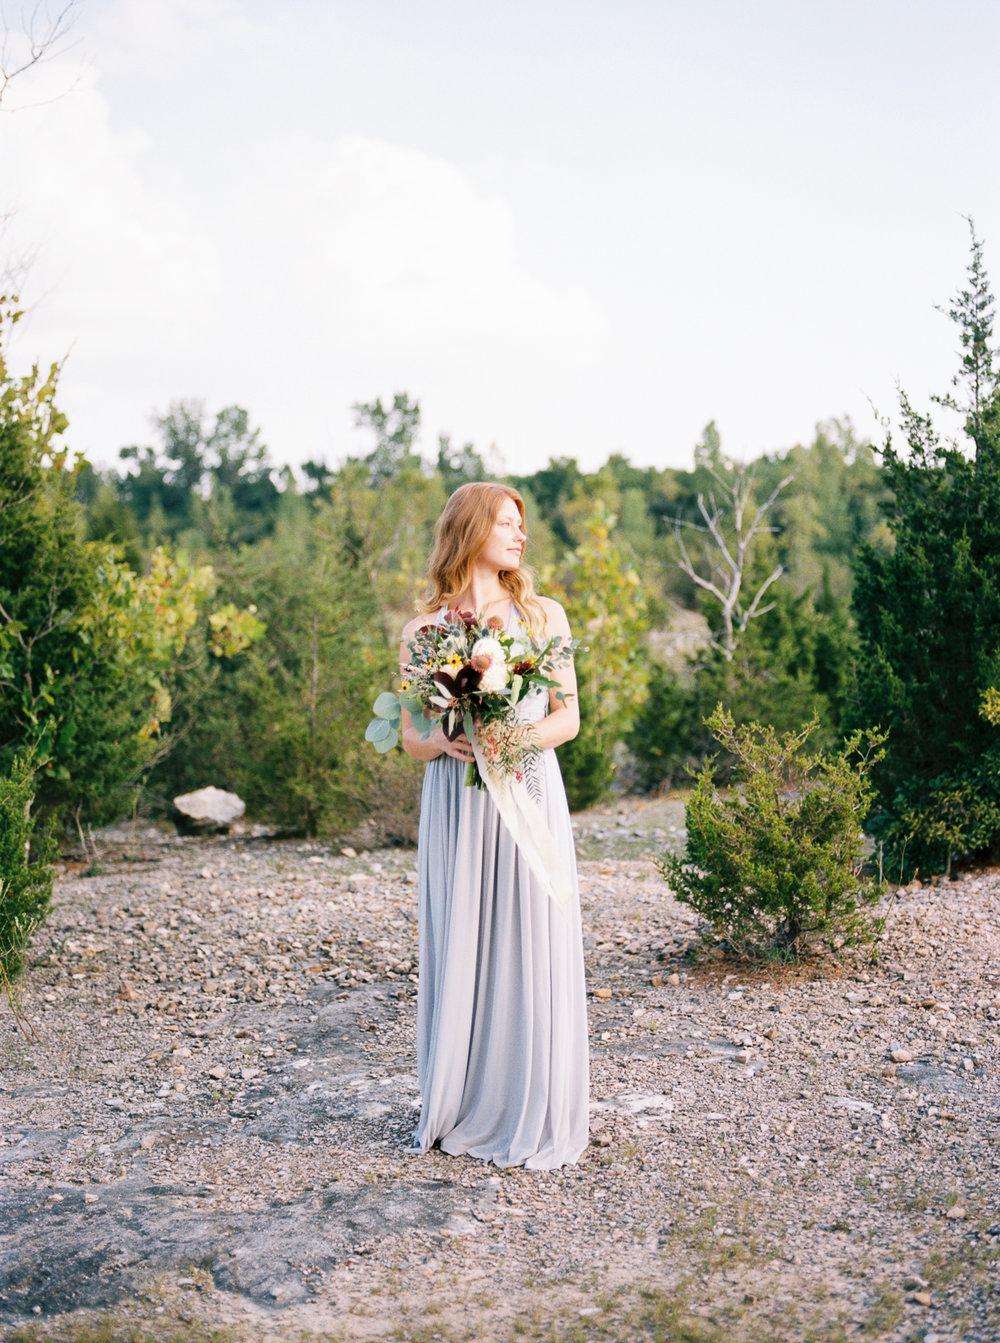 Fine_Art_Film_Wedding_Photographer_Tonya_Espy_Photography-33.jpg